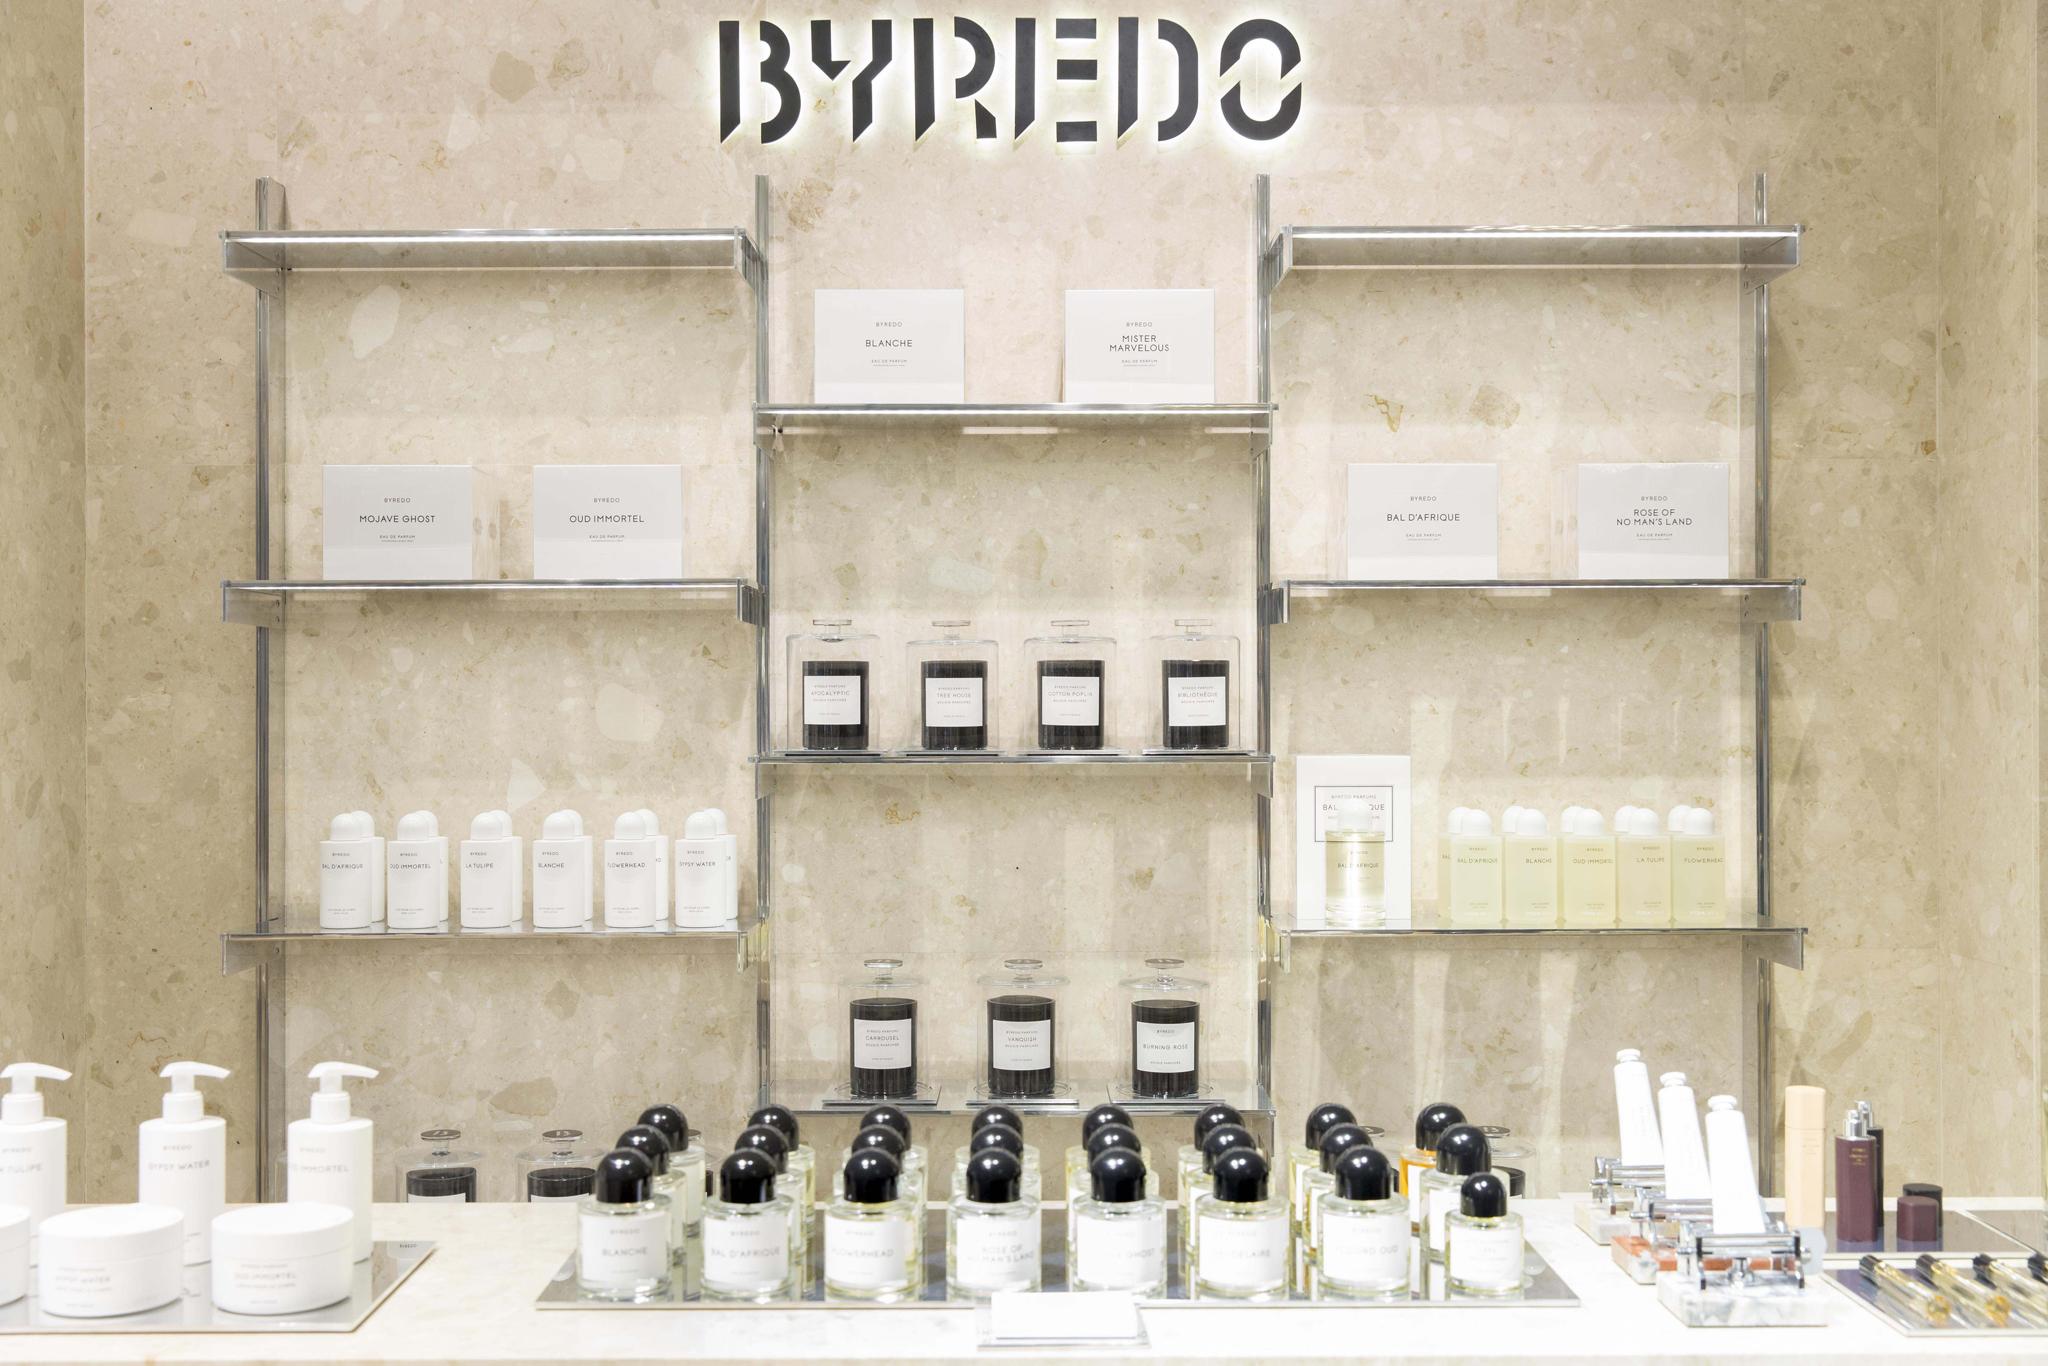 Byredo display area in Lane Crawford.